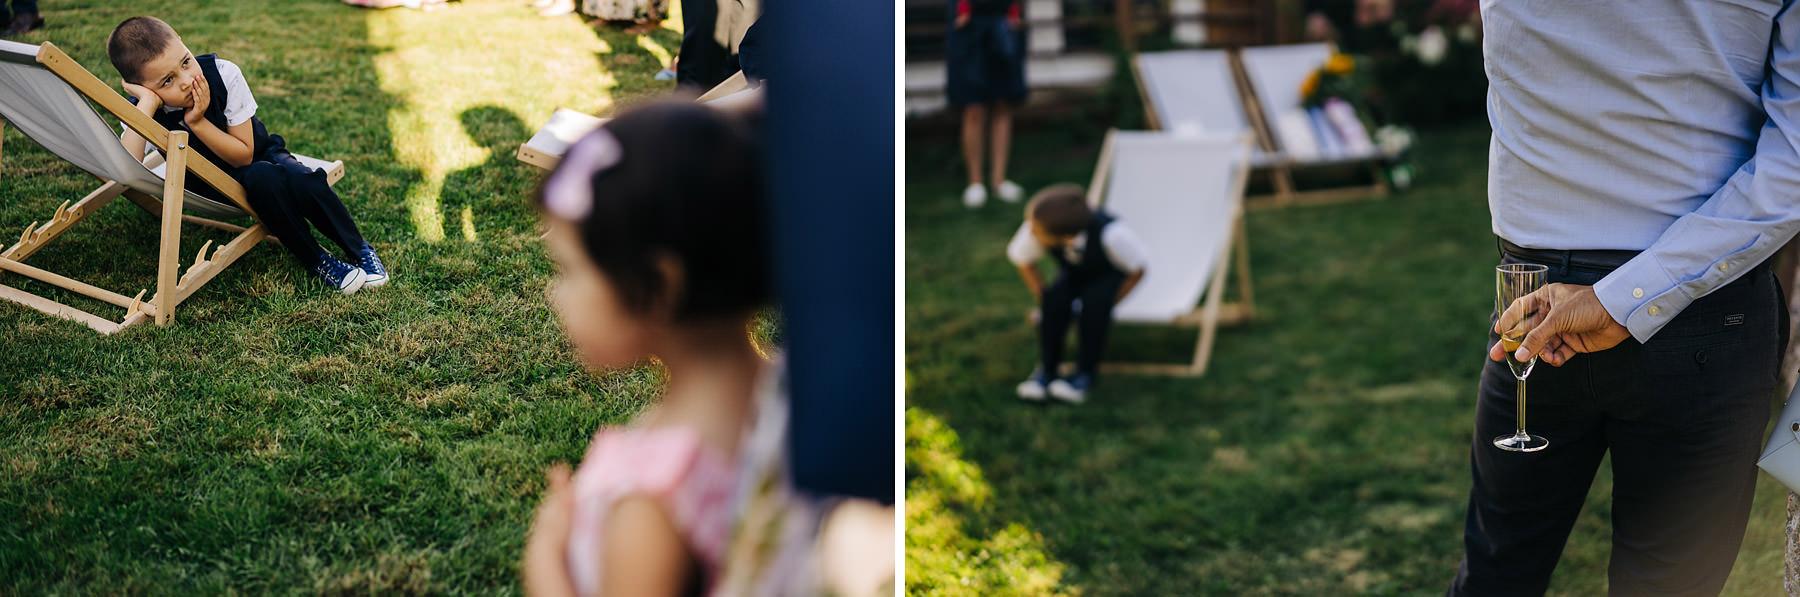 ogród babette slow wedding